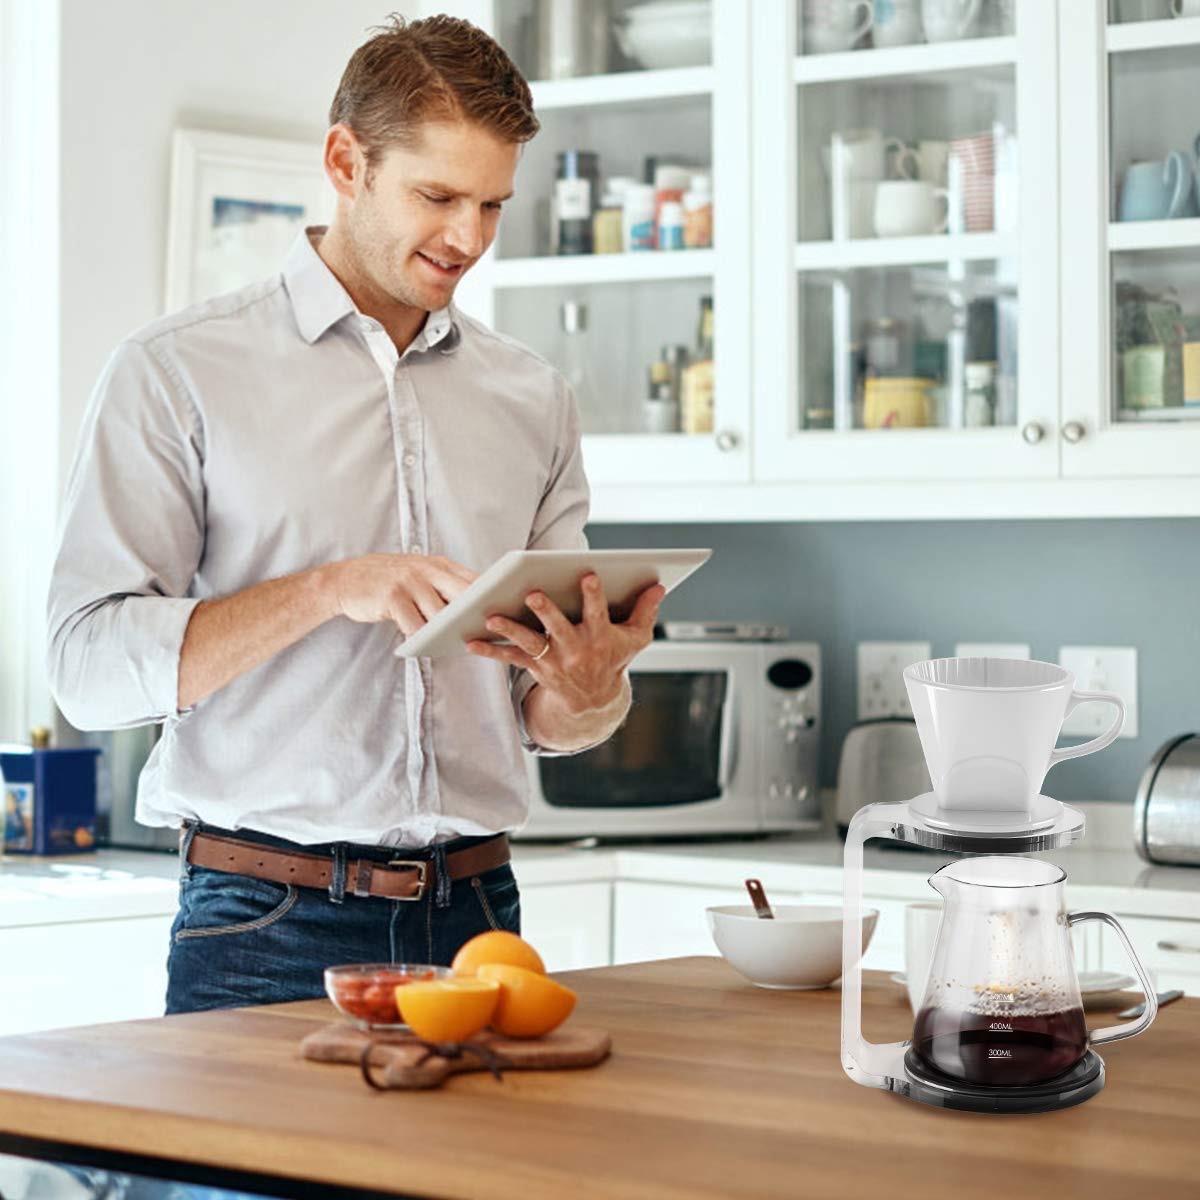 white man standing in kitchen next to coffee maker